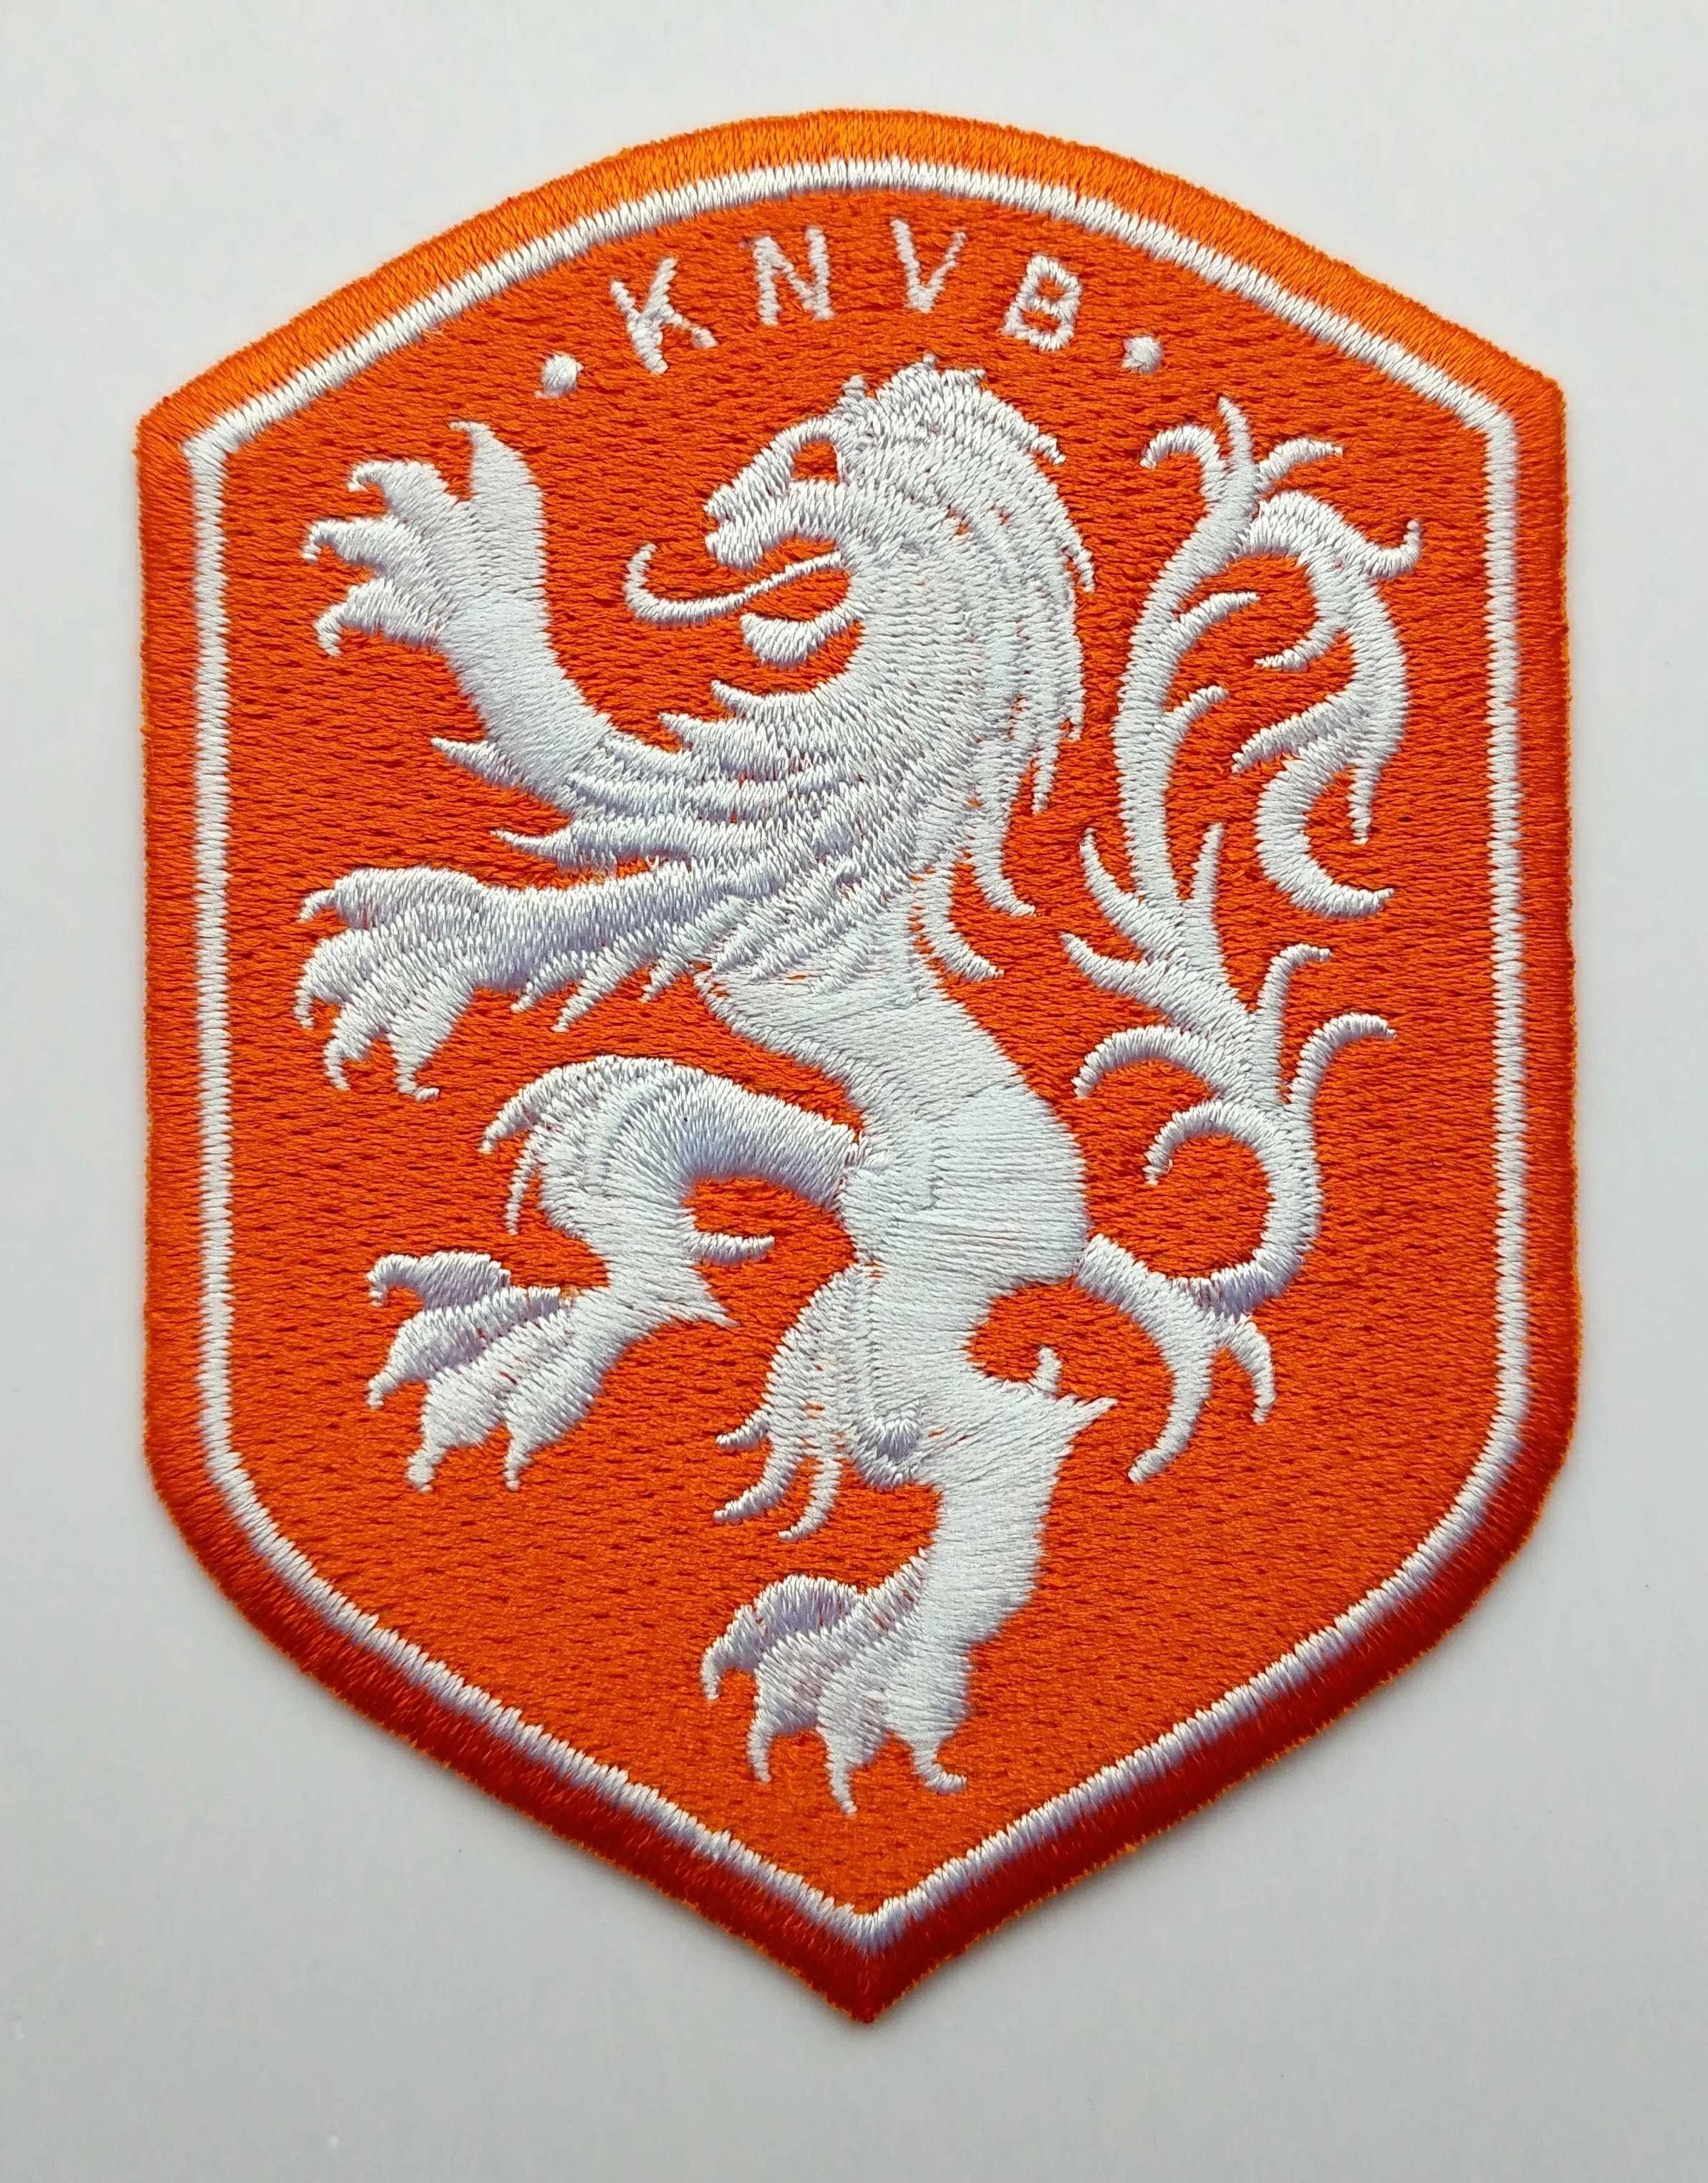 Aufnäher Fußball Soccer Football club Bilbao1 Athletic patch Bügelbild iron on